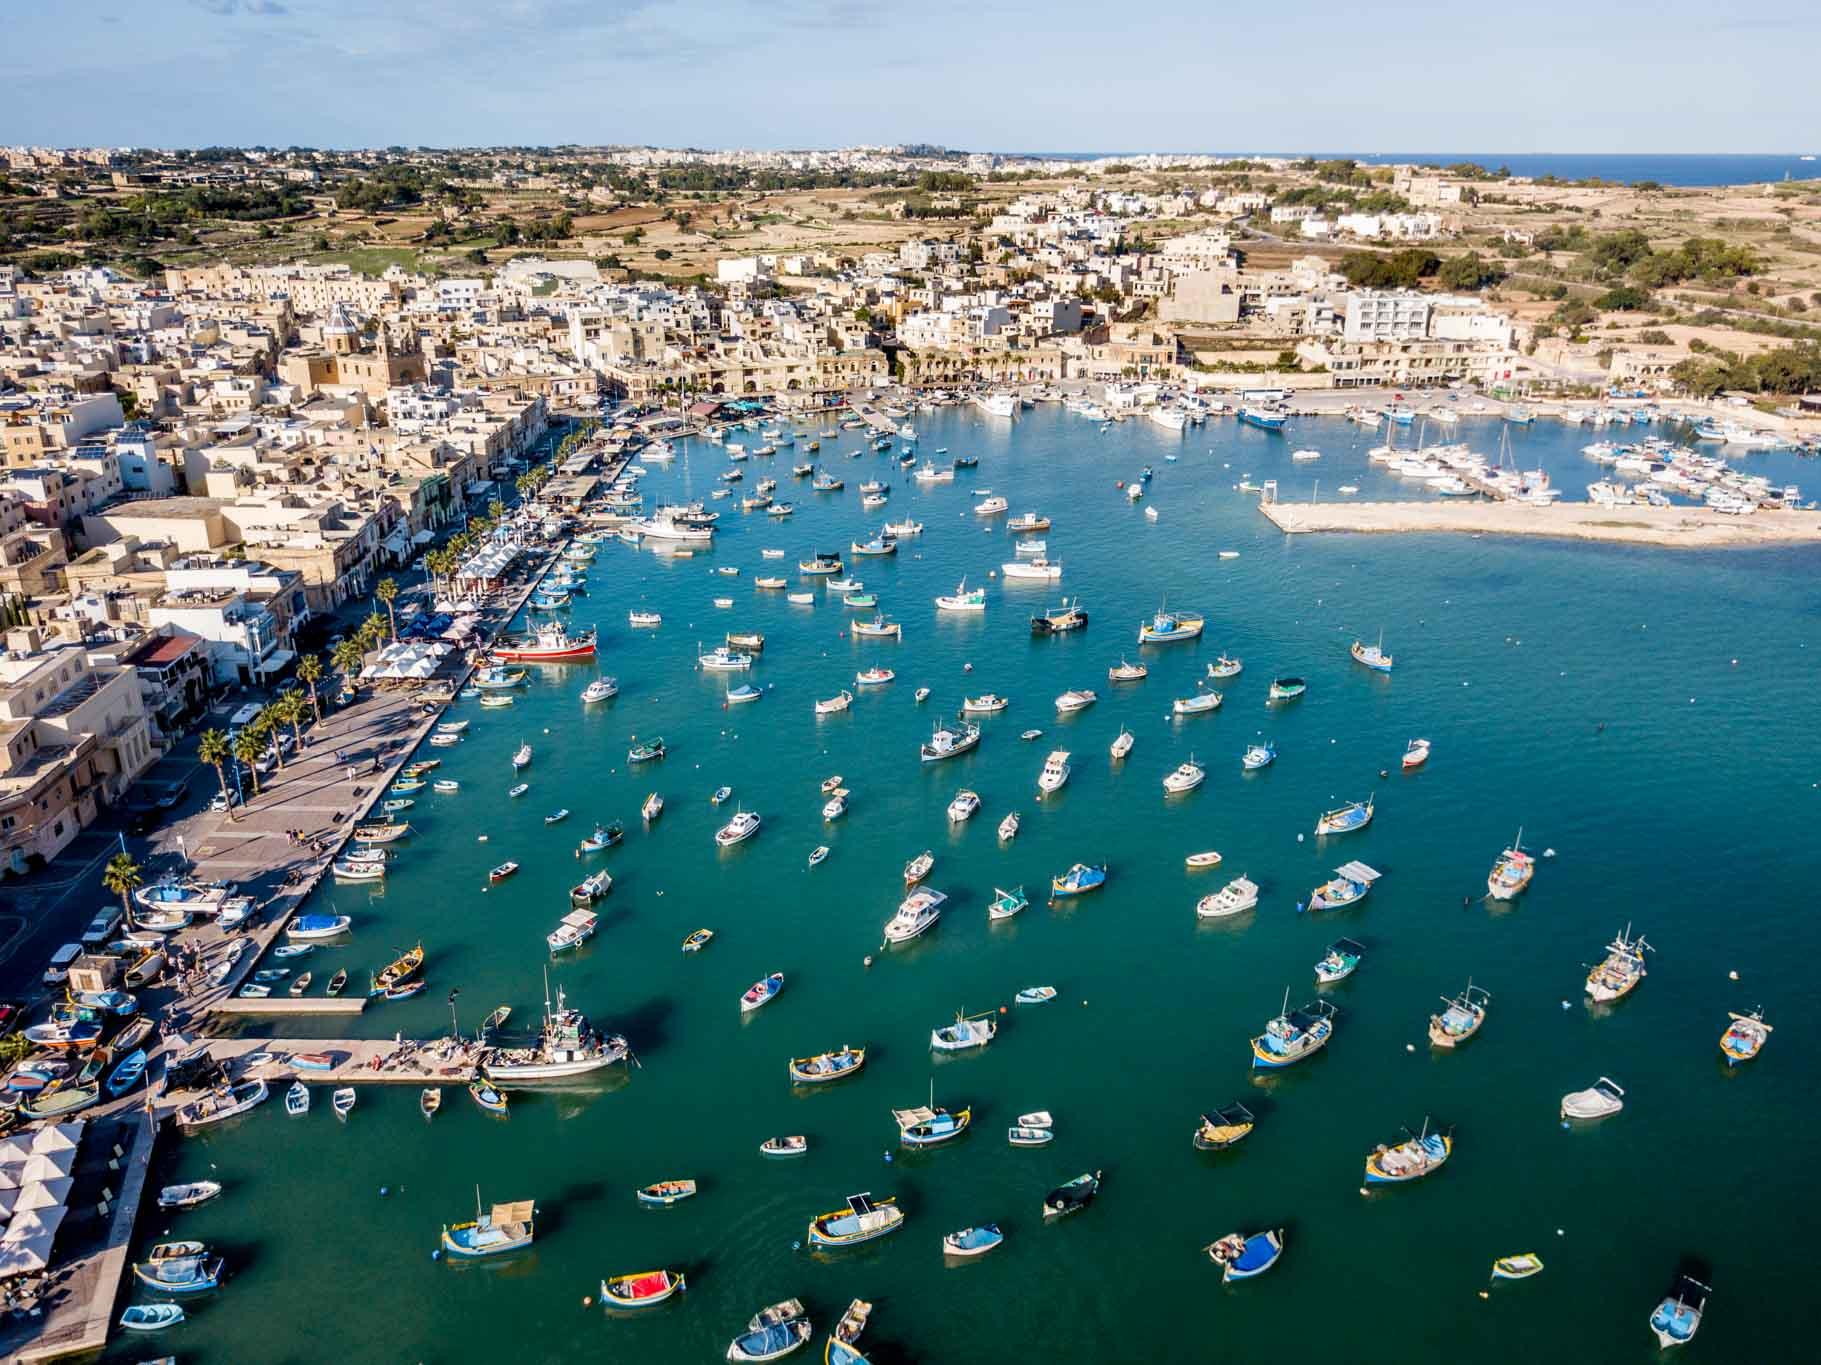 Marsaxlokk, Malta, a traditional fishing village